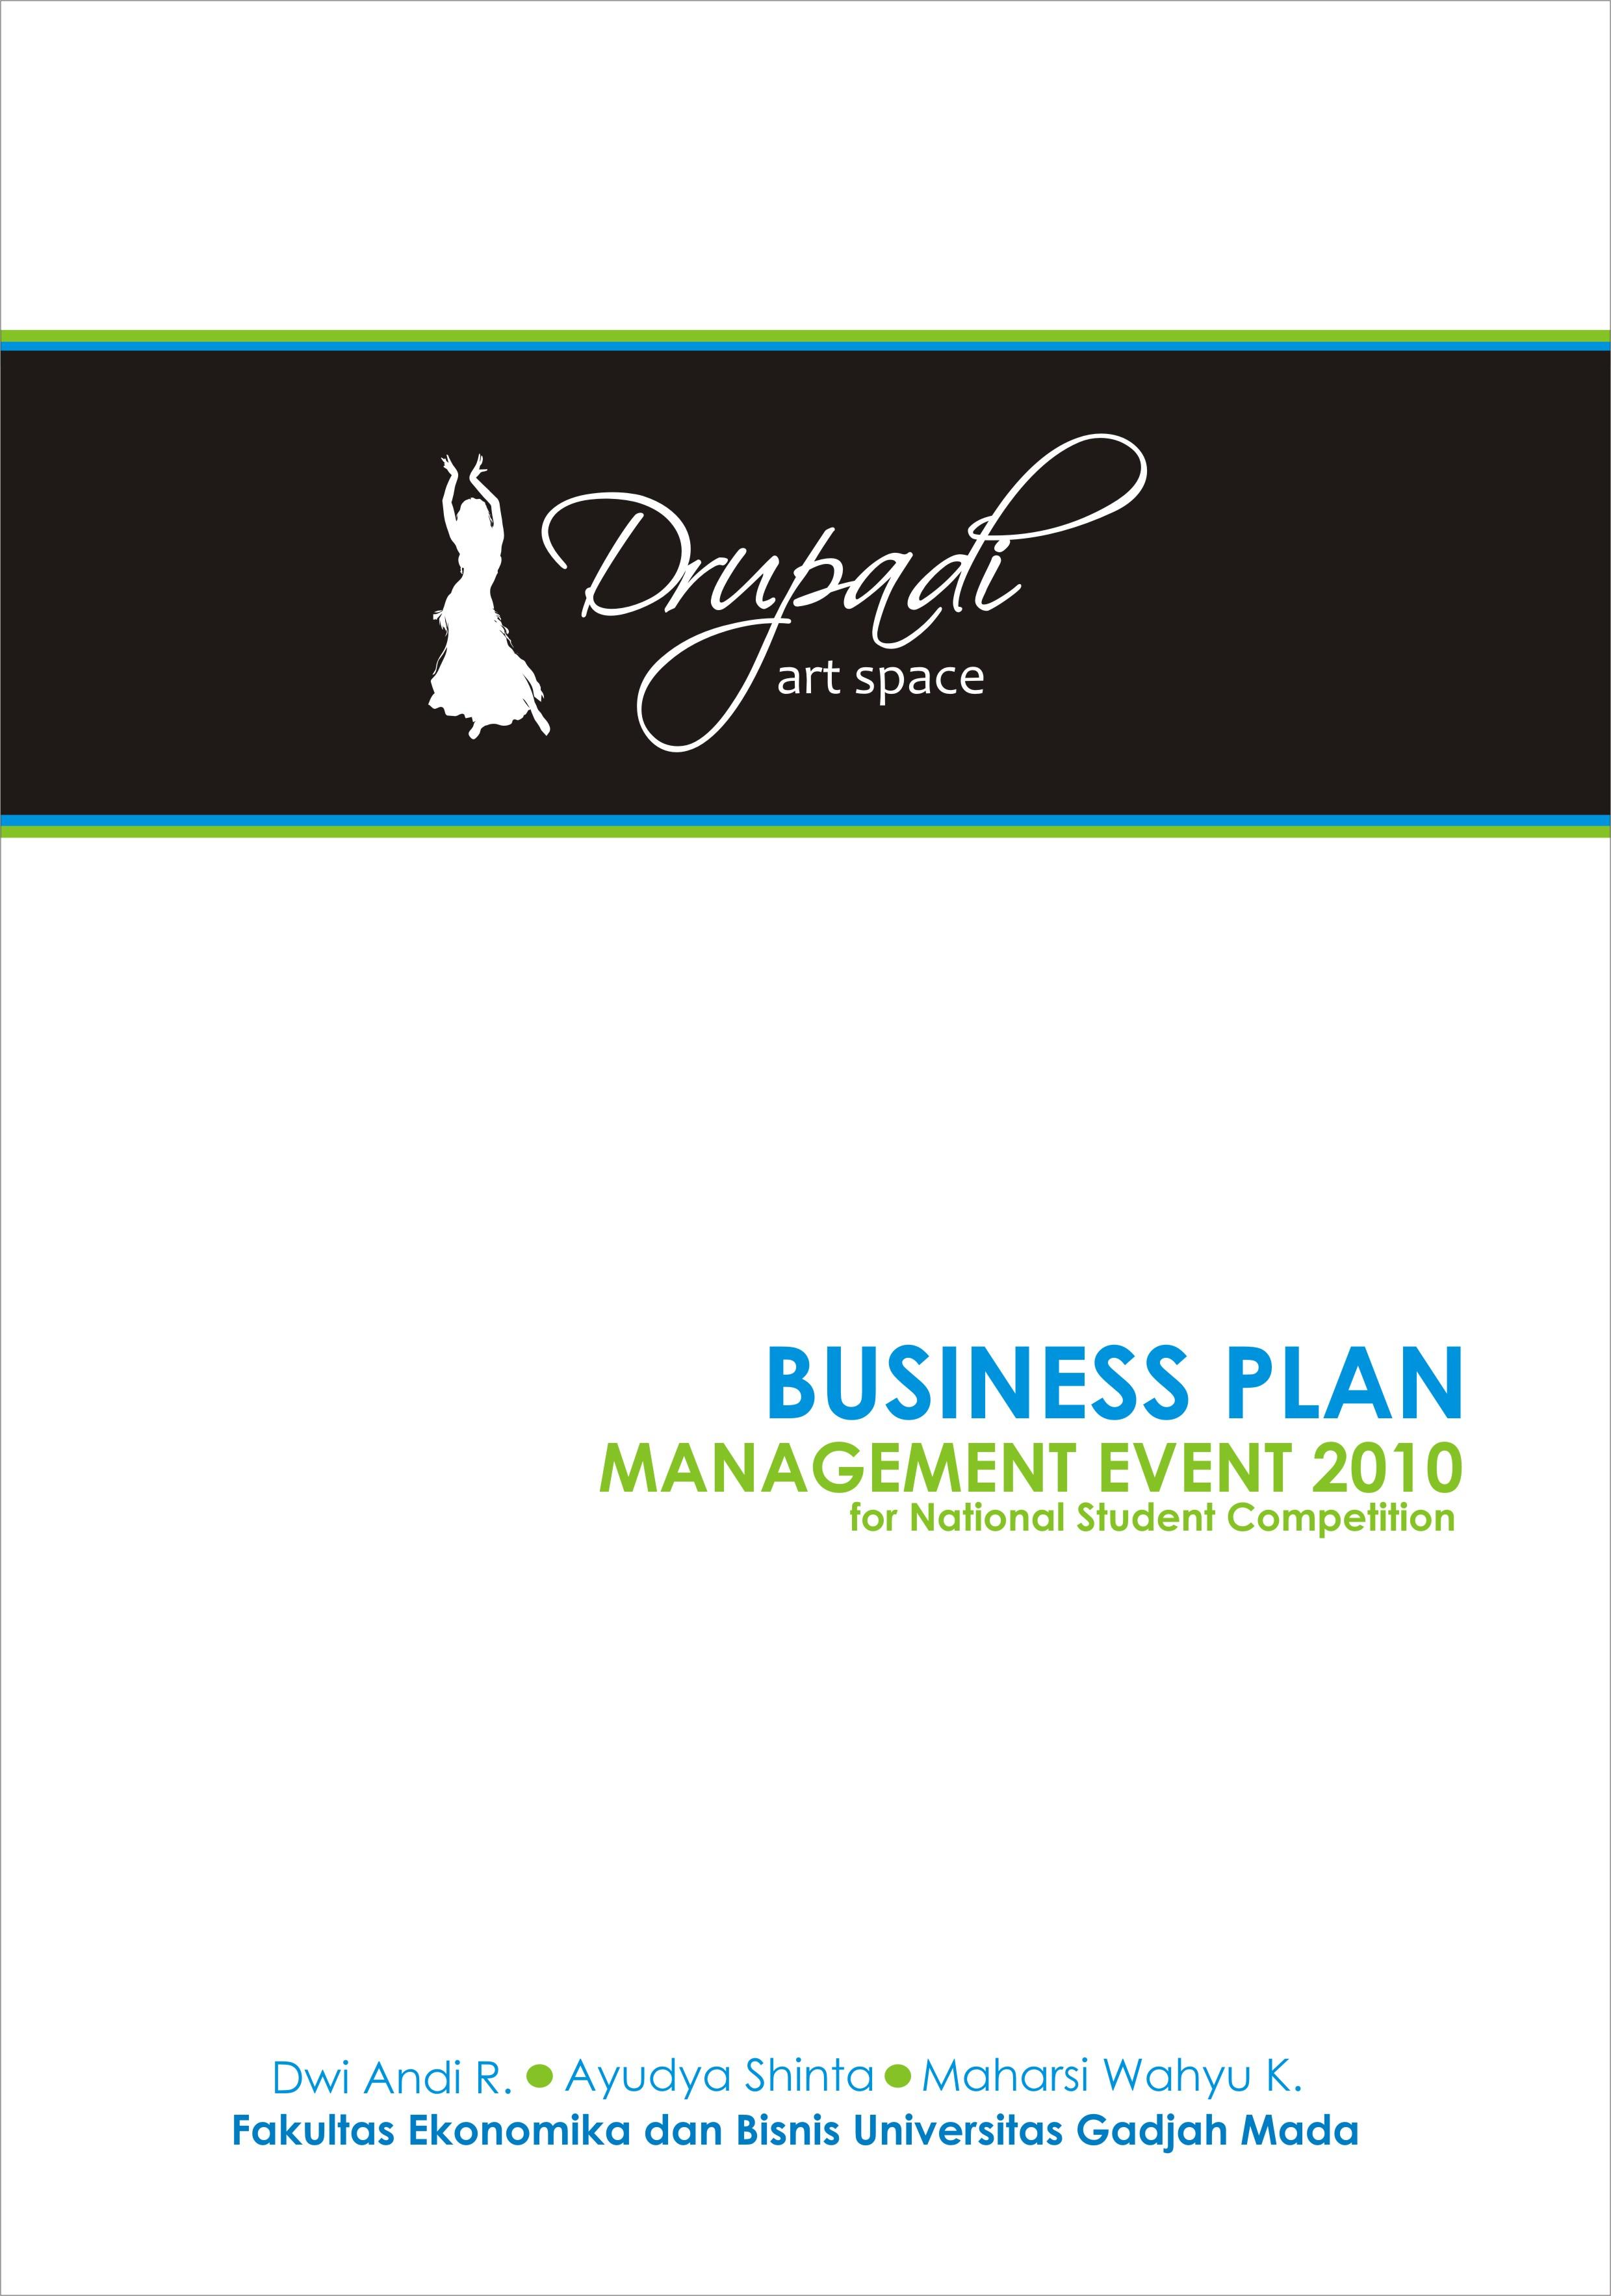 Management Event Ugm 2010 Social Business Plan Competition Nggetih Yang Terbayarkan Kepingan Mozaik